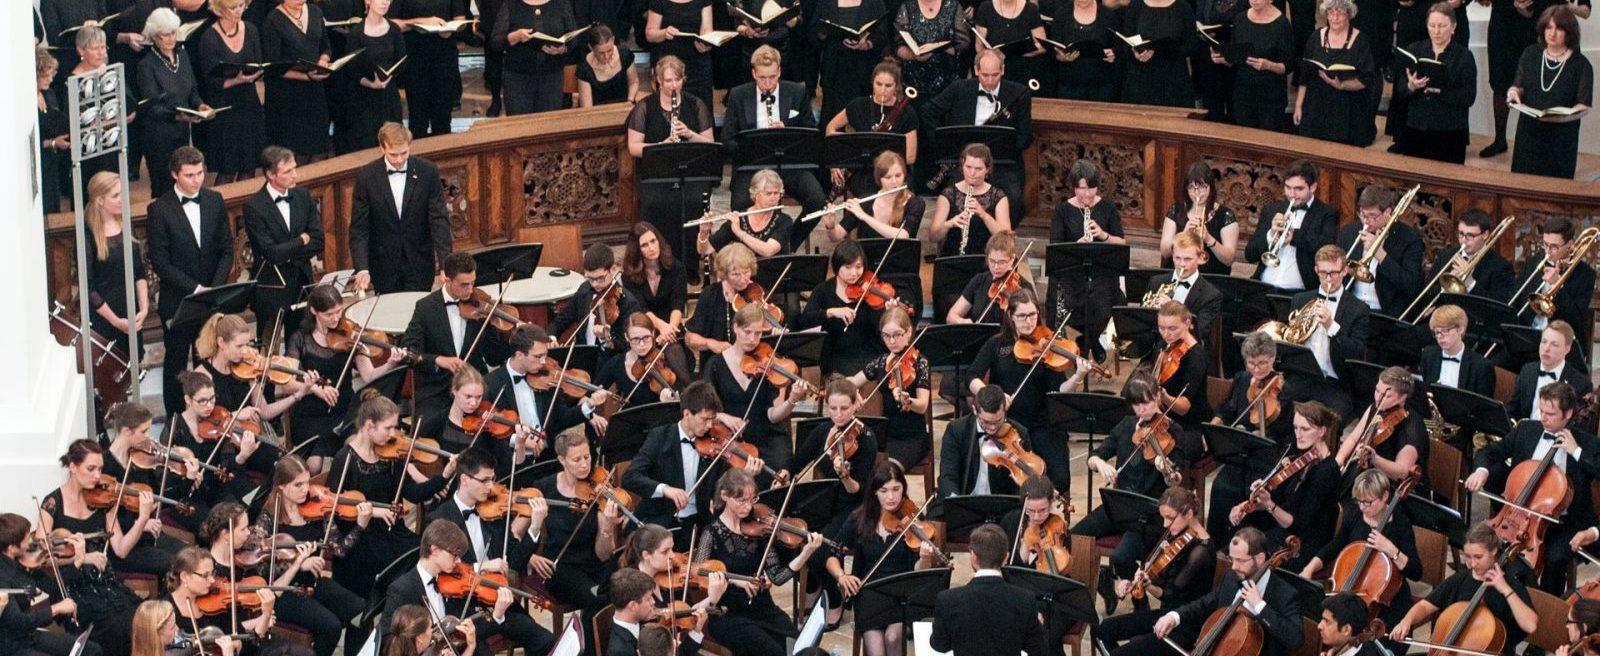 Großes AGV Orchester Landshut Stiftungsfest